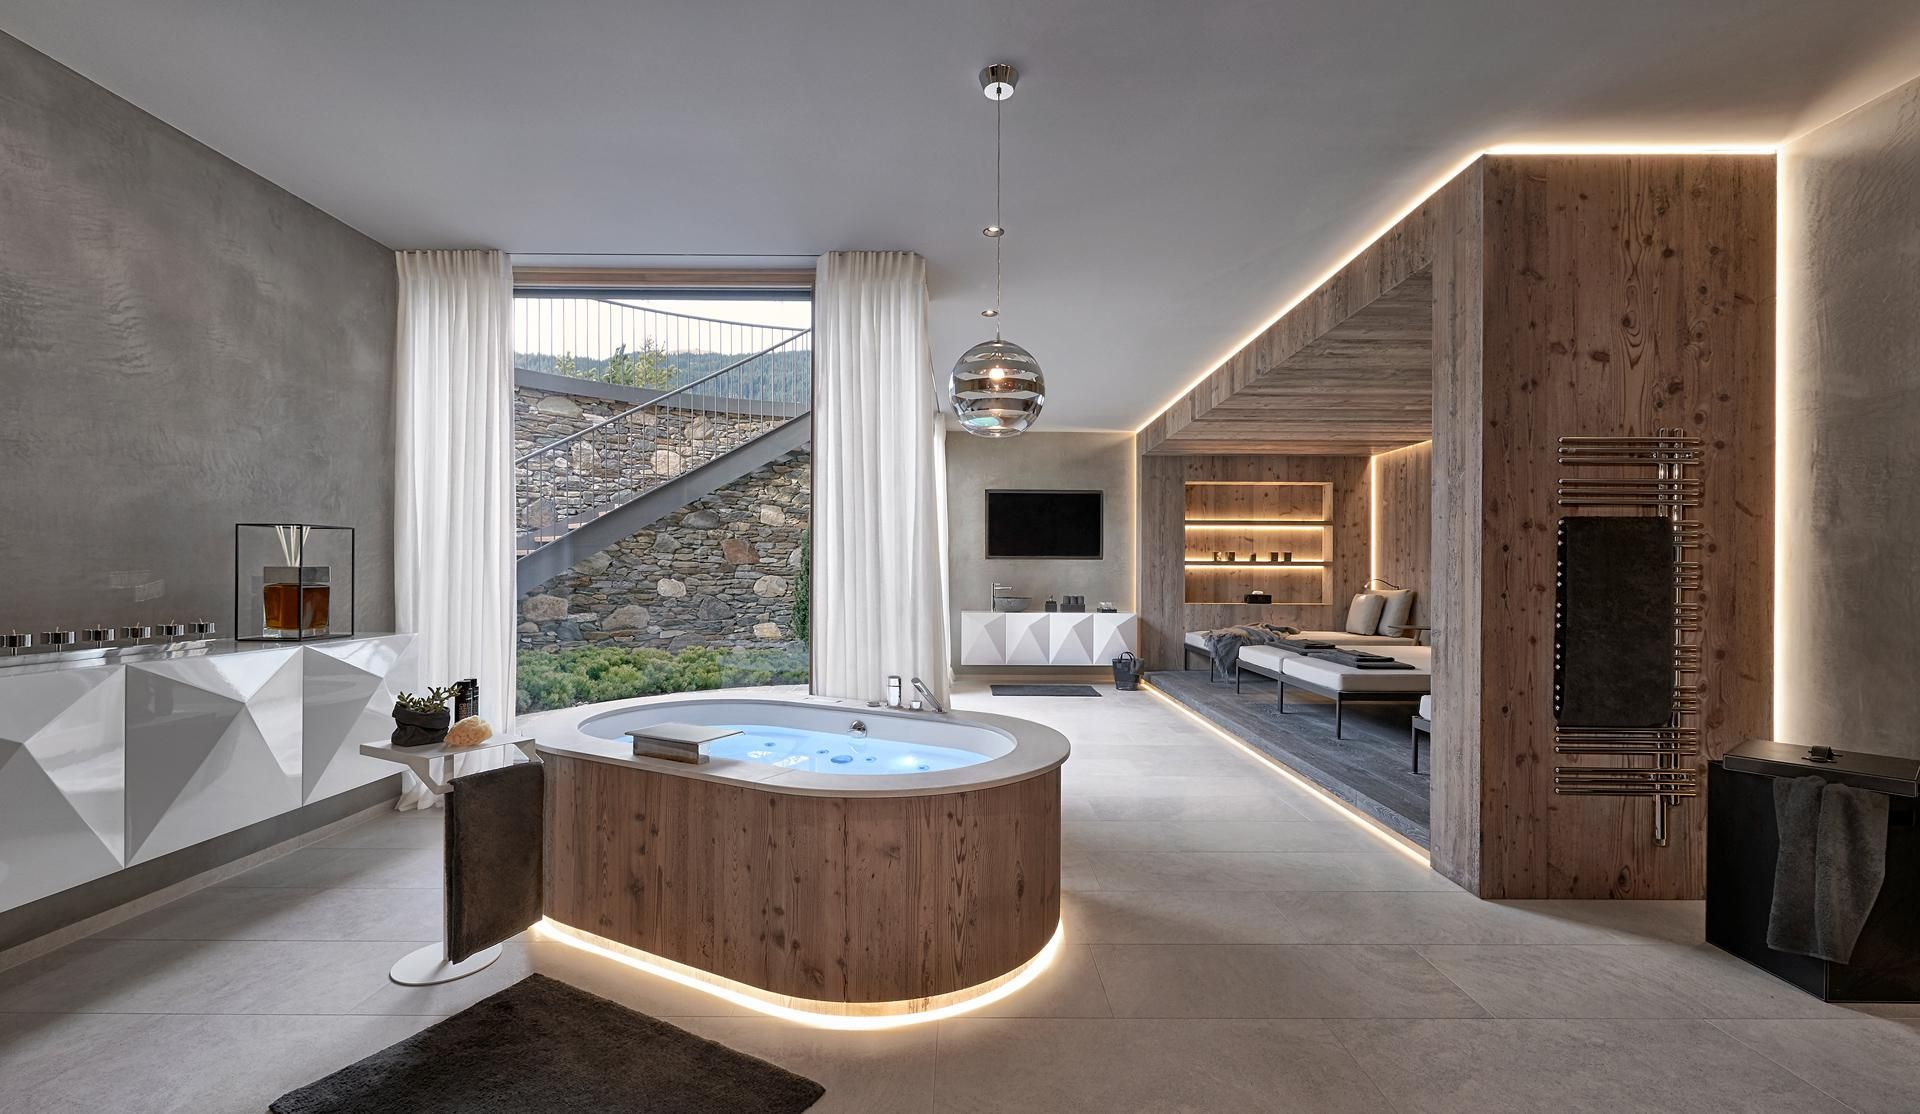 Gasteiger Bad Kitzbuhel Wellness Sauna Dampfbad Schwimmbad